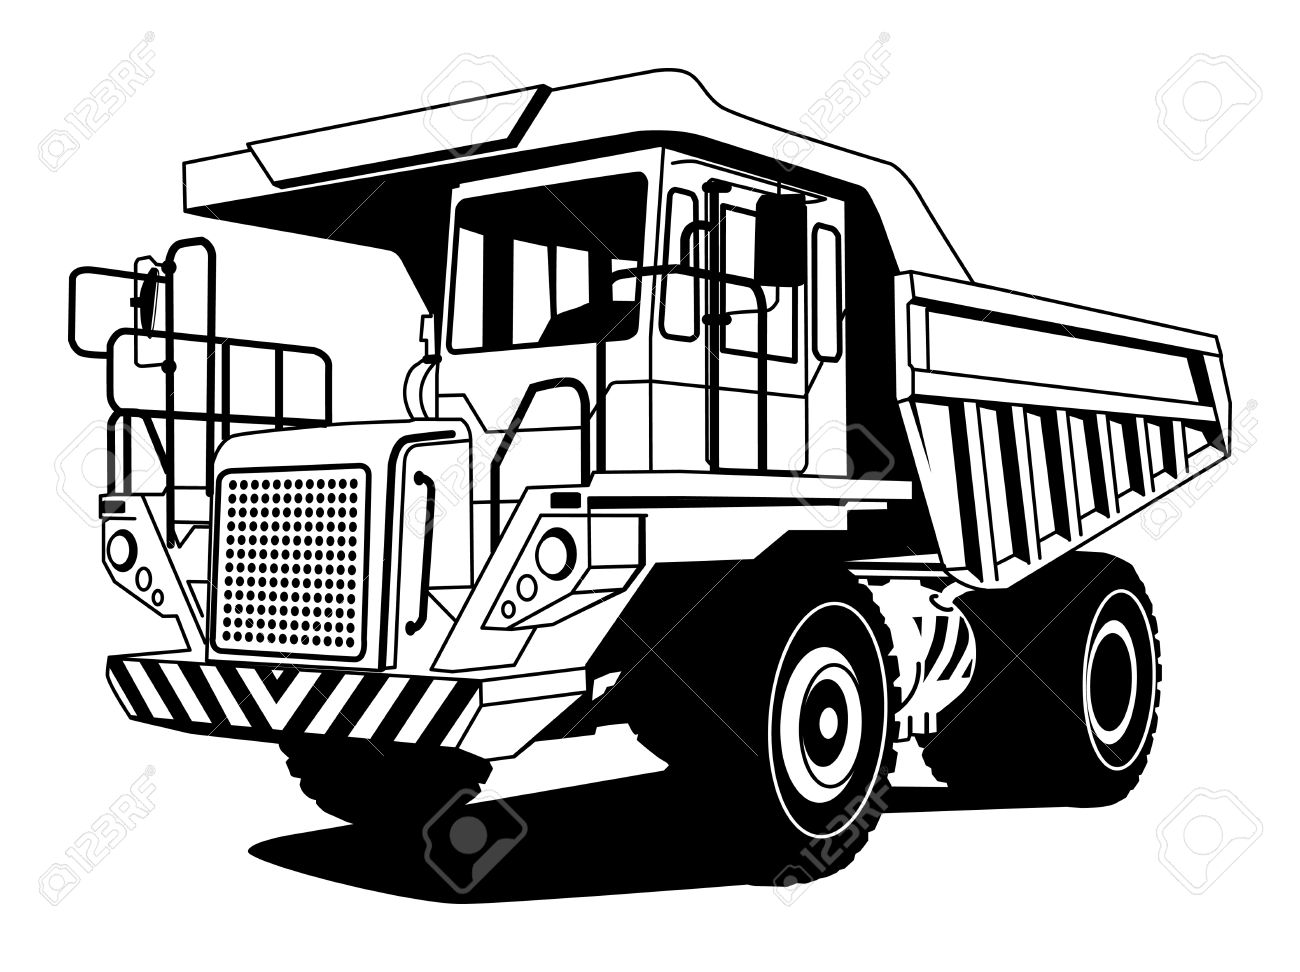 Dump truck hand draw illustration Stock Vector - 14169782